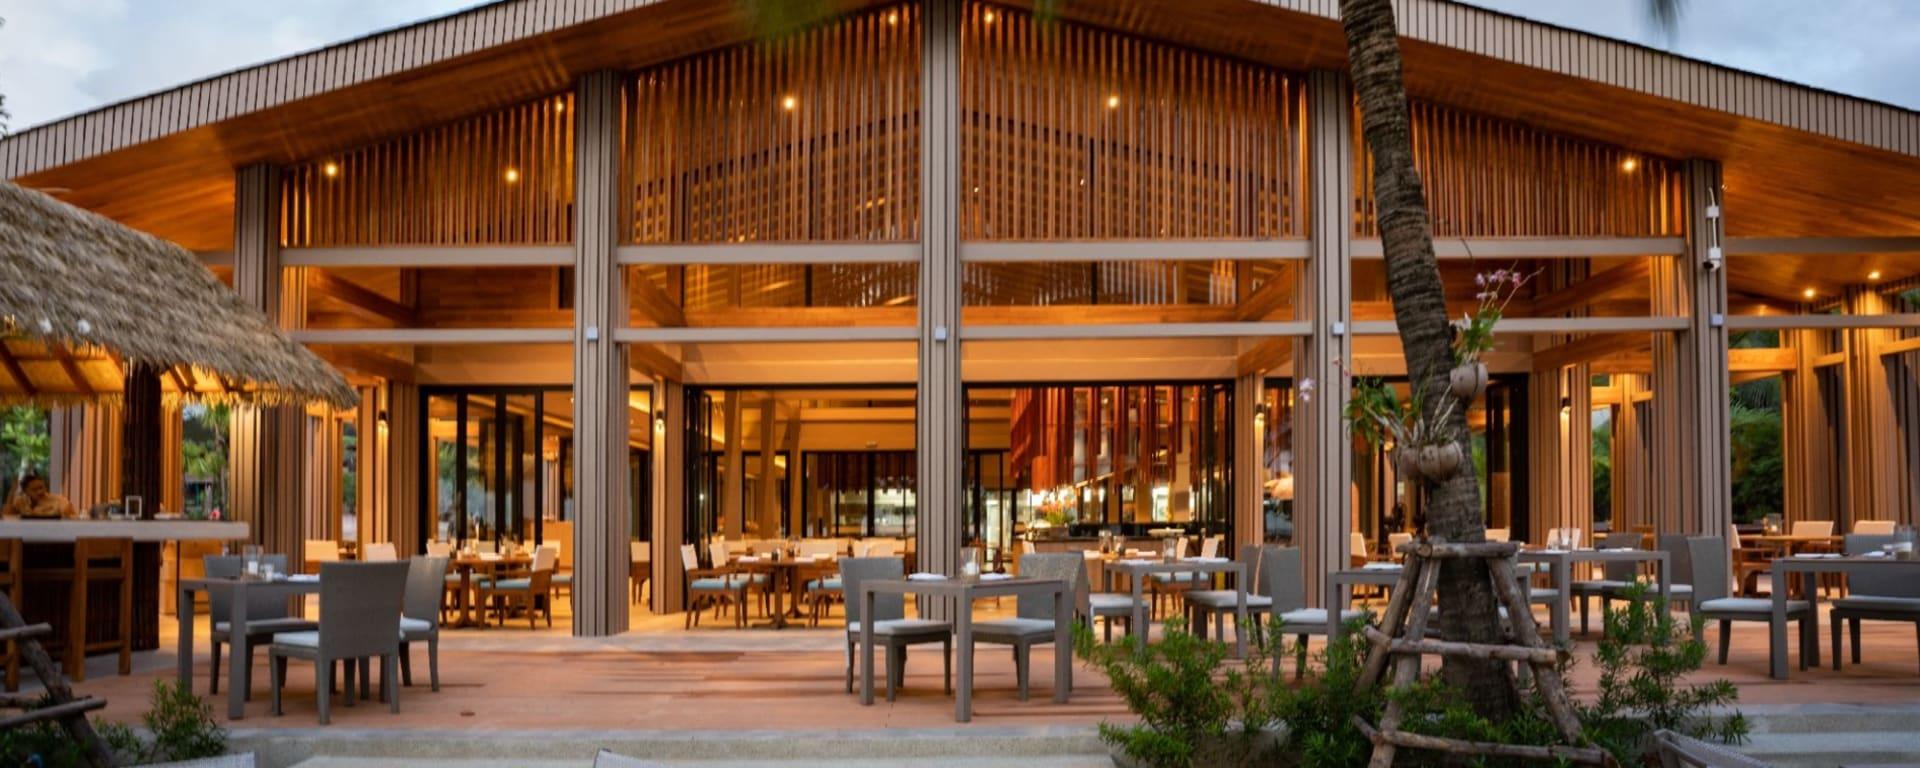 La Flora Khao Lak: Sire restaurant